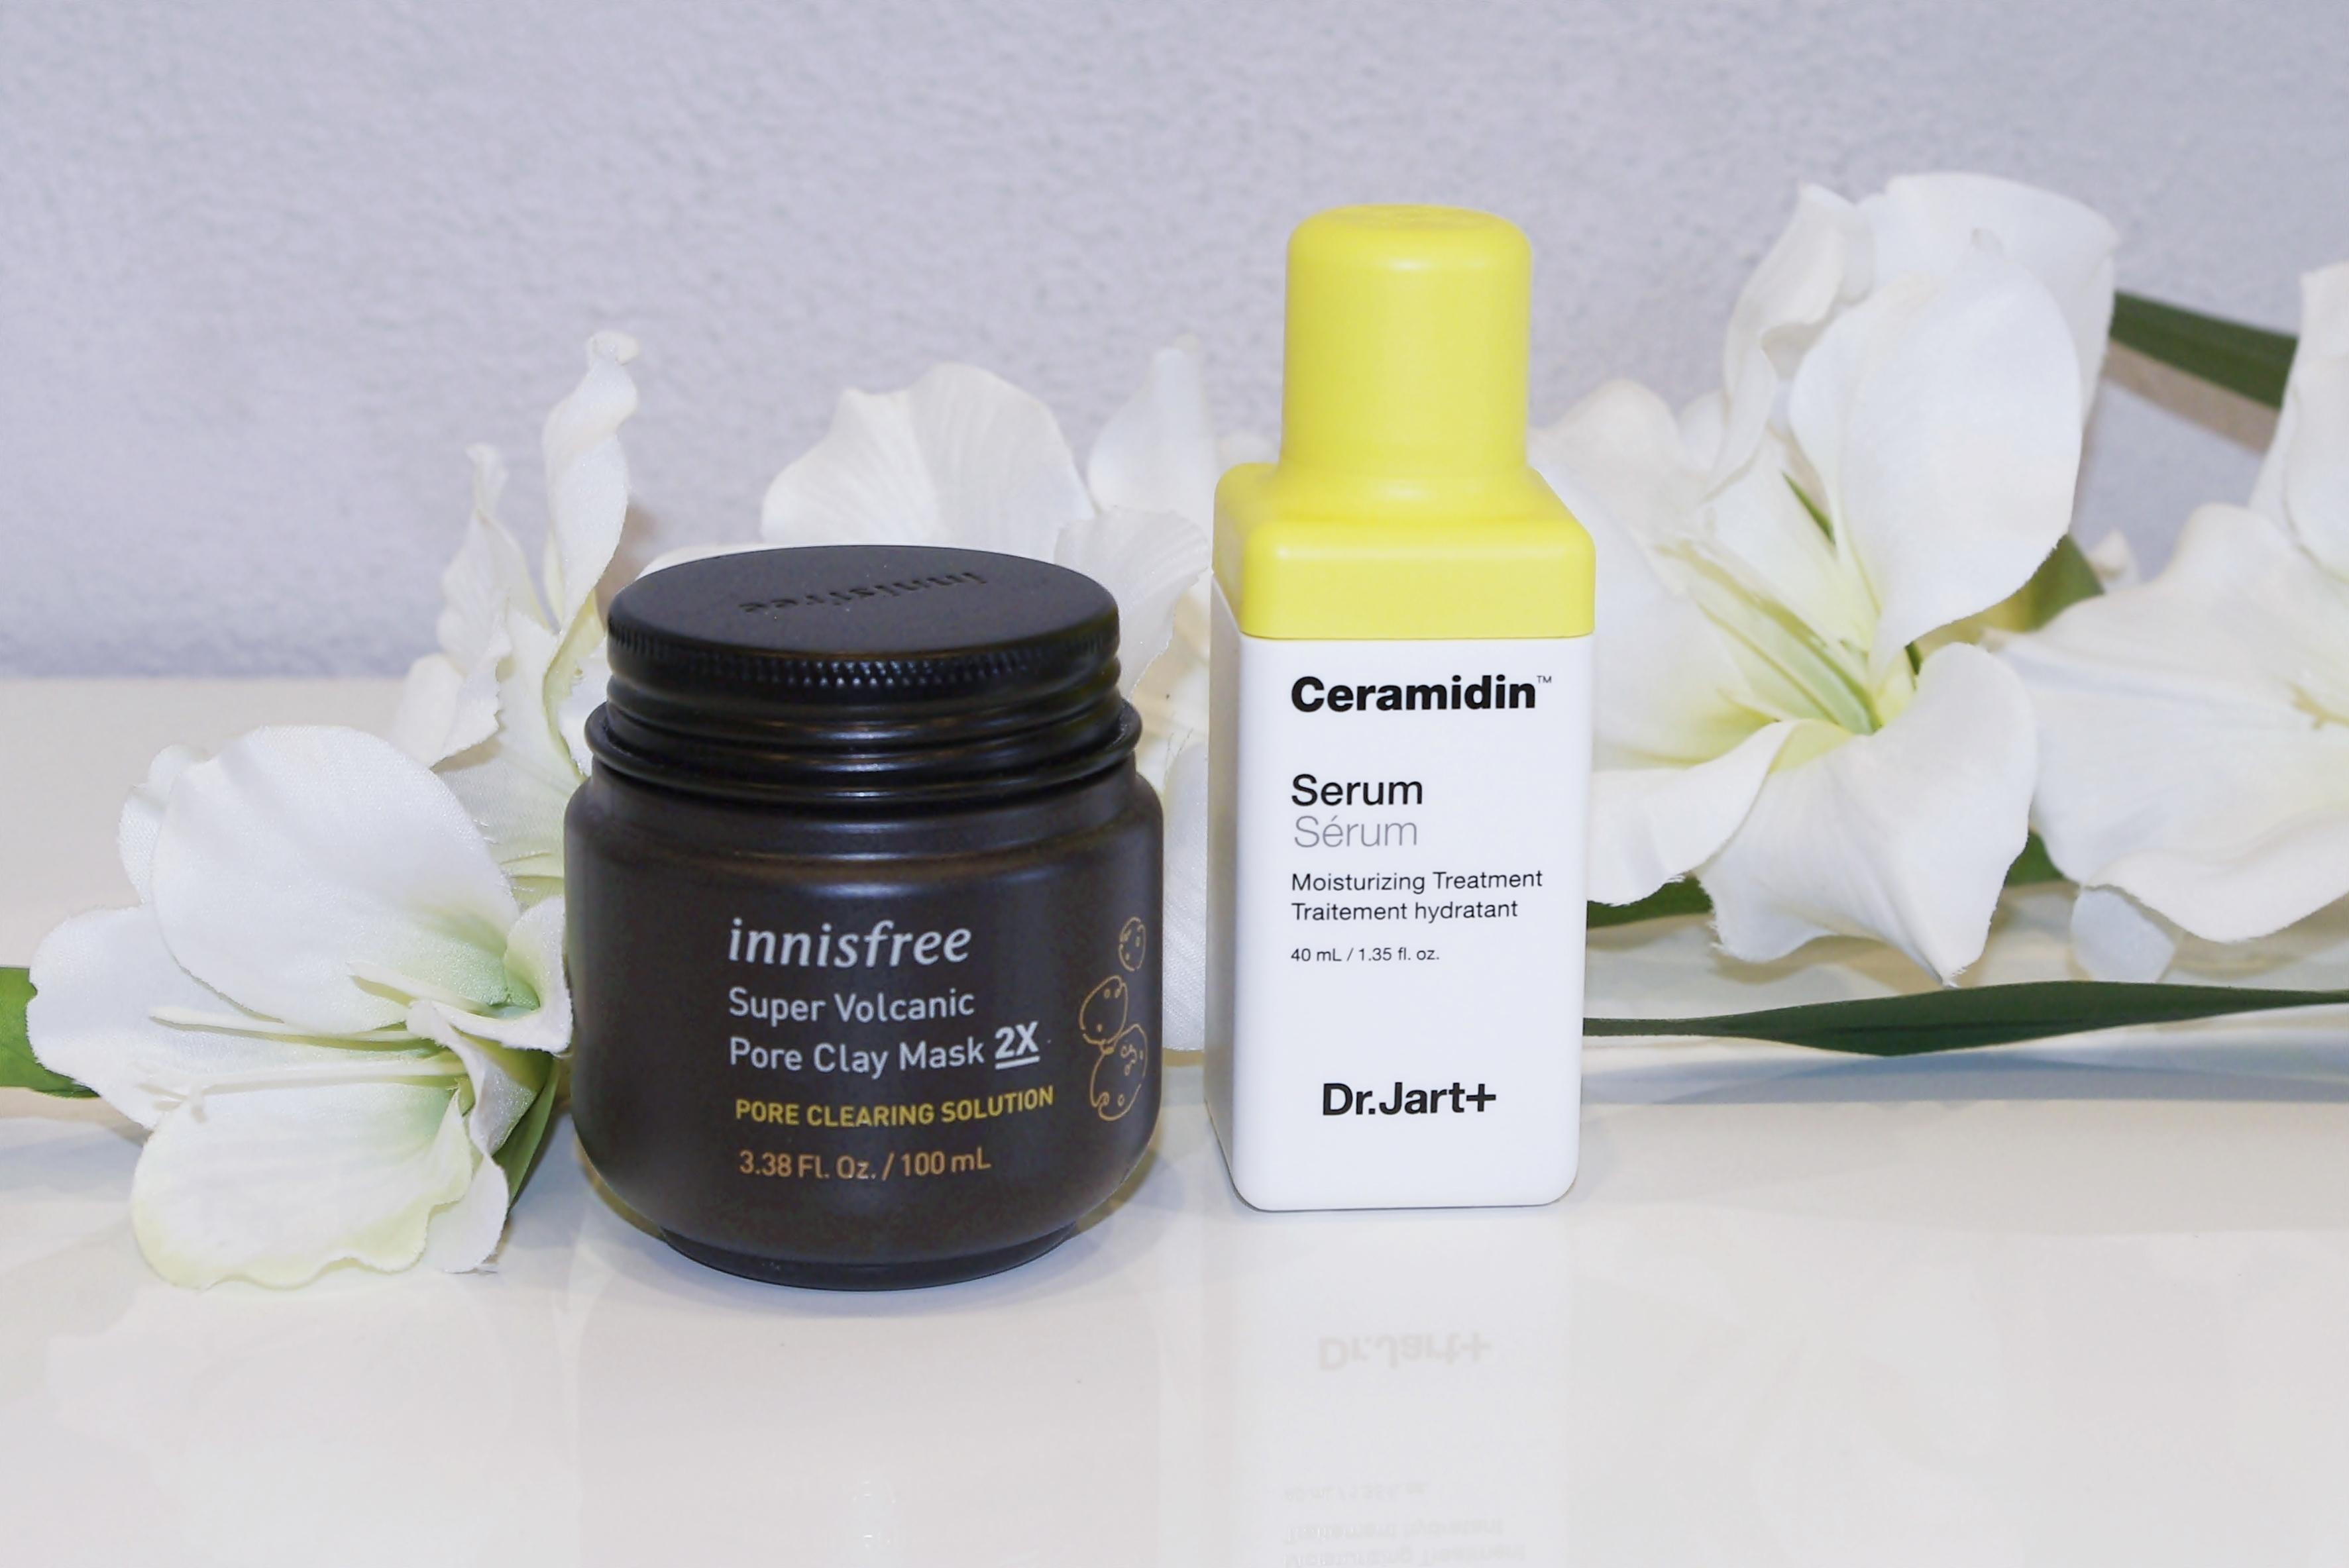 Dr. Jart+ Ceramidin Serum Innisfree Super Volcanic Pore Clay Mask 2X